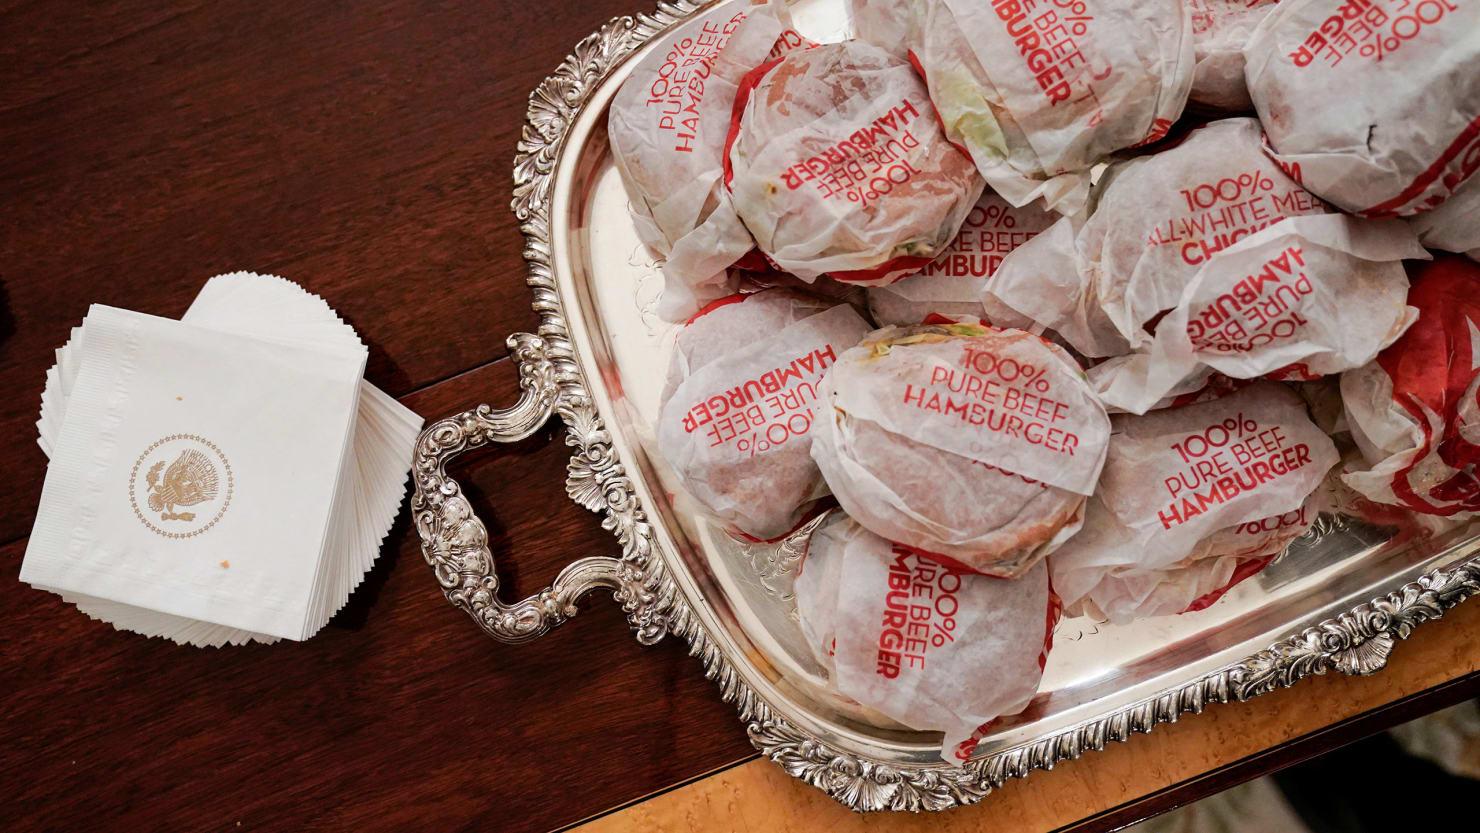 D.C. Eateries Grimace at Trump's Fast-Food Kick